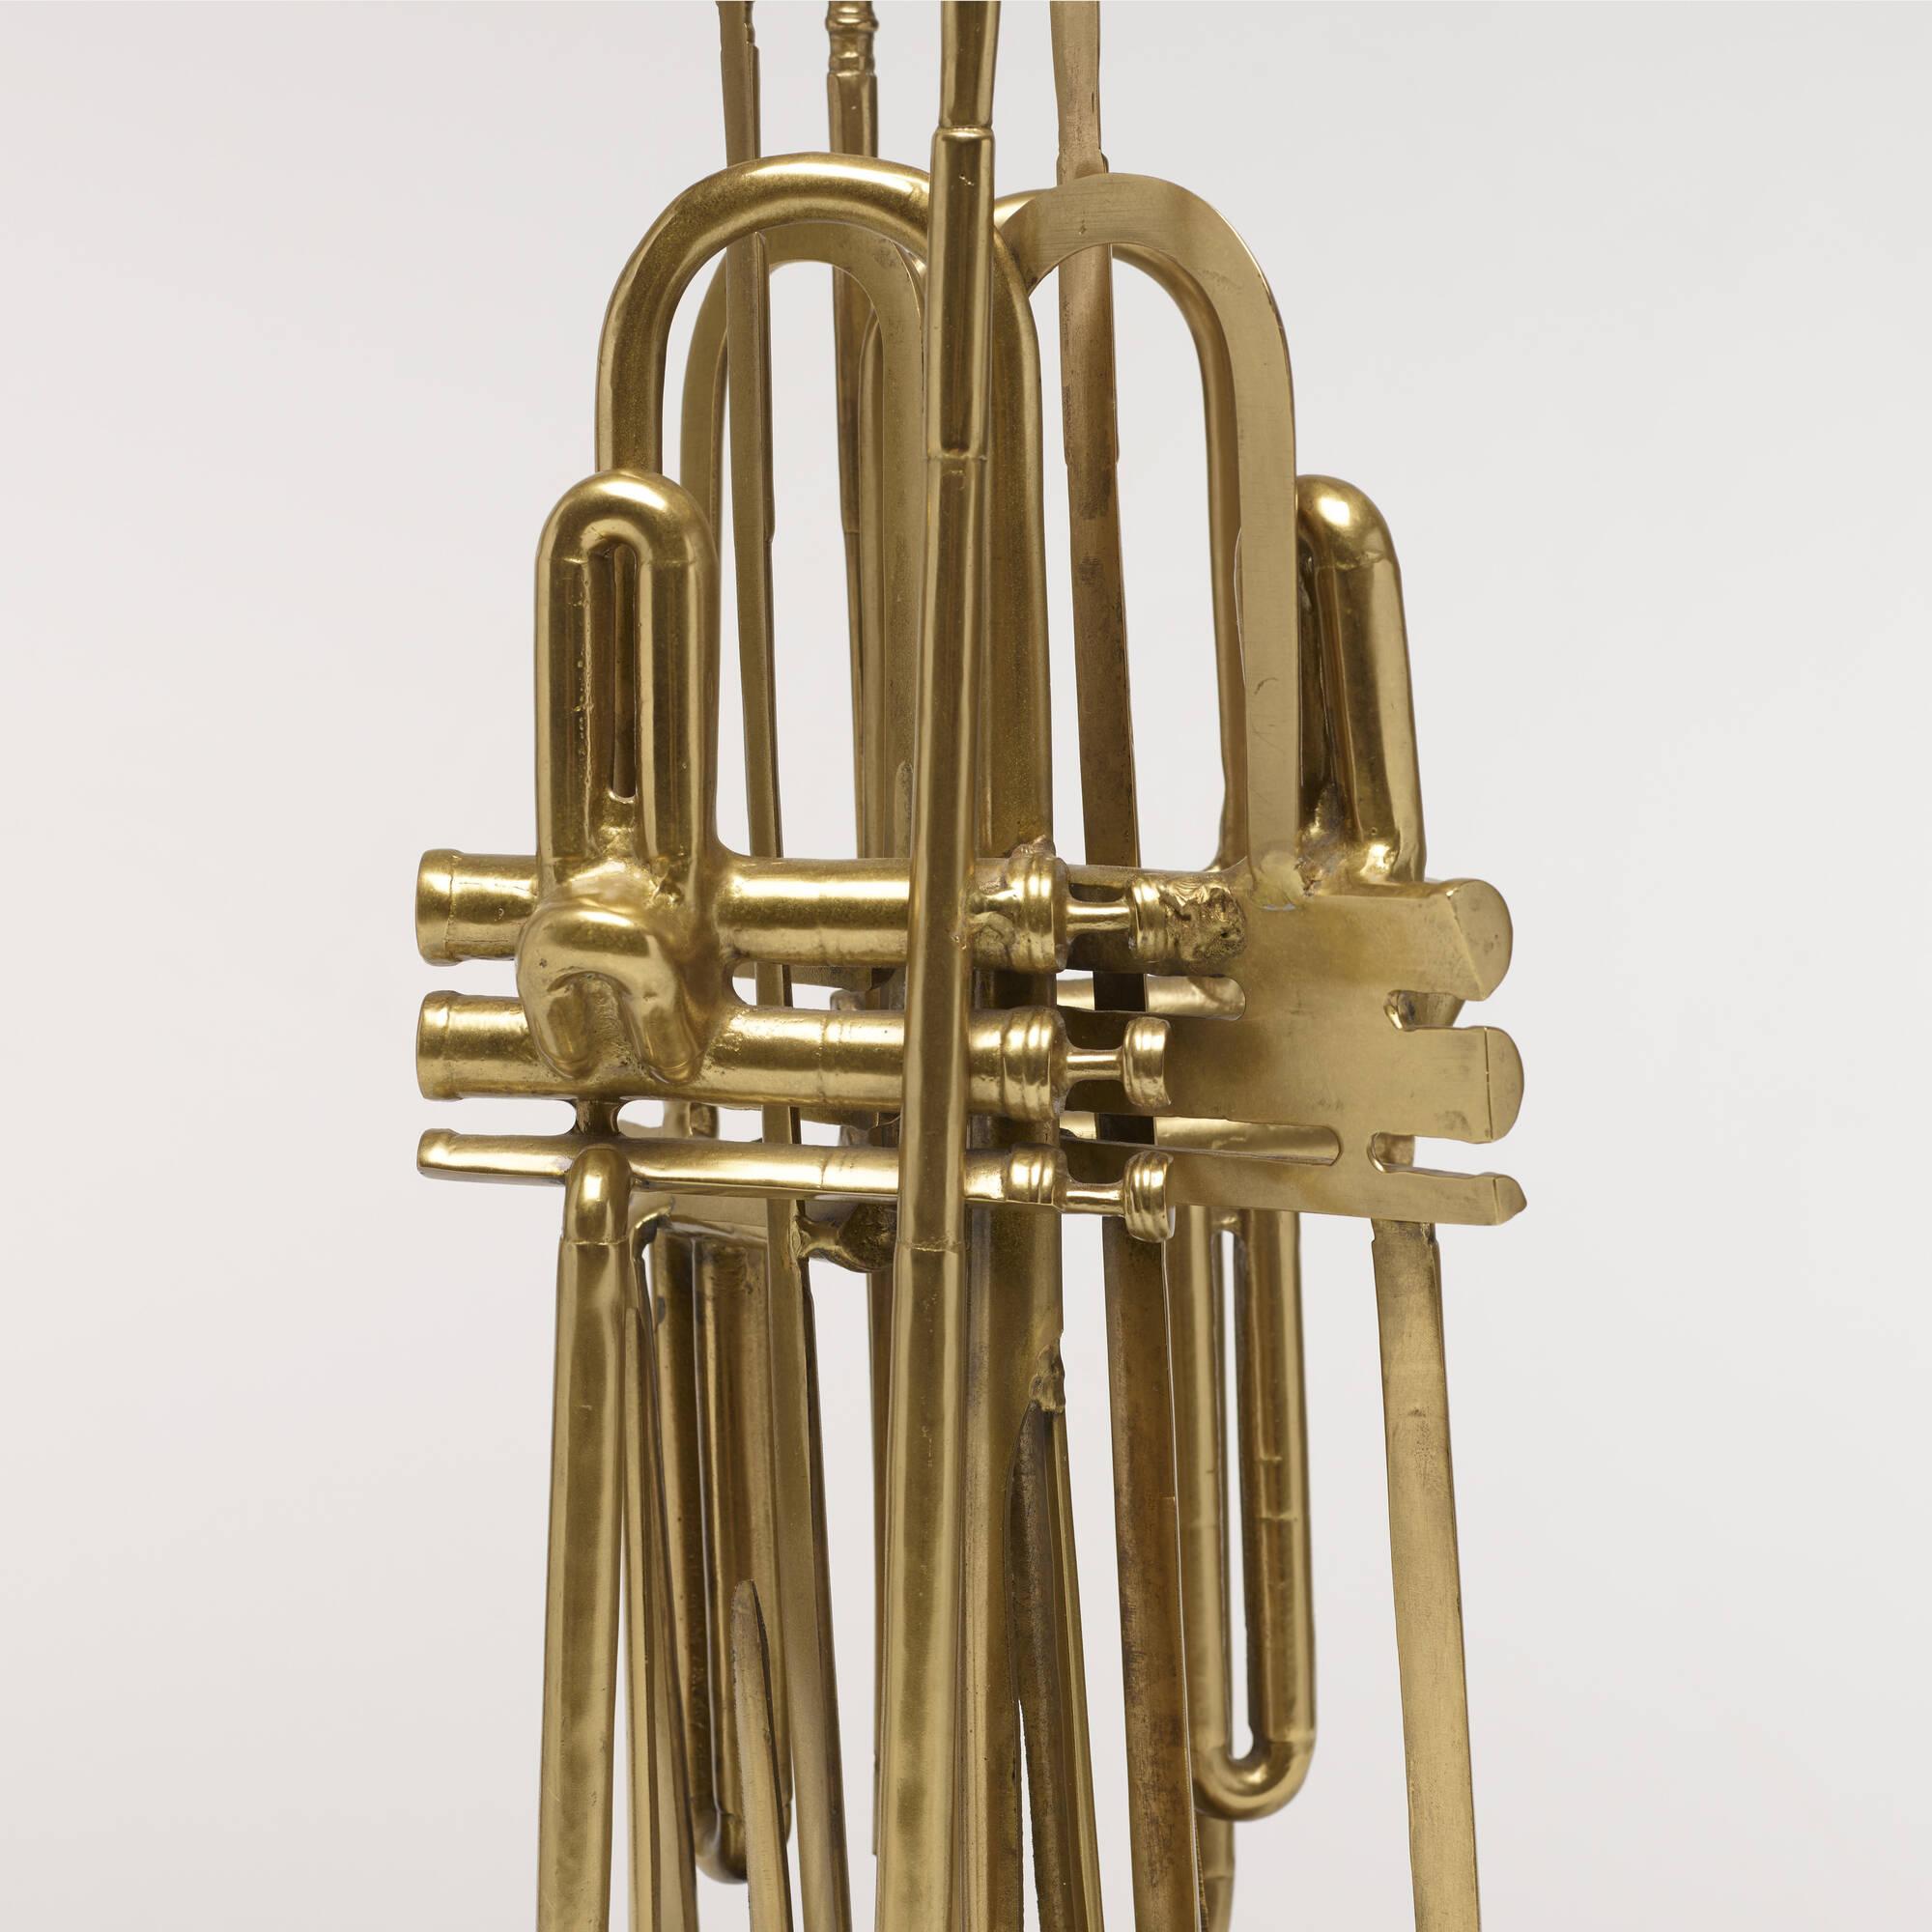 169: Arman / Sliced Trumpets (3 of 3)